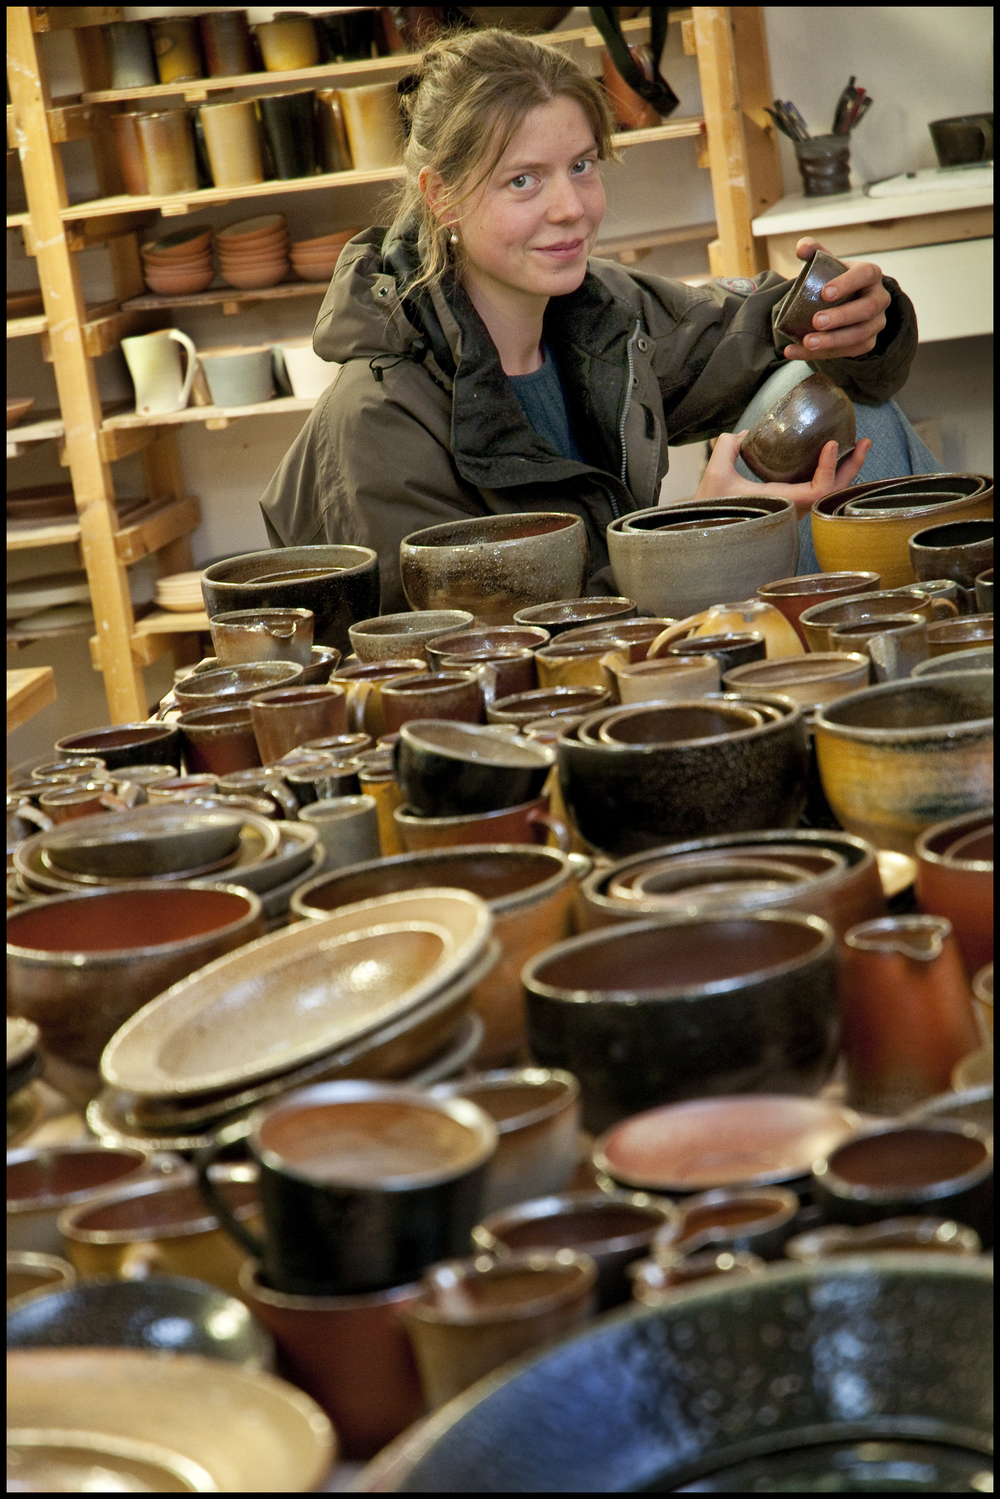 Production Potter, Britta Wengeler